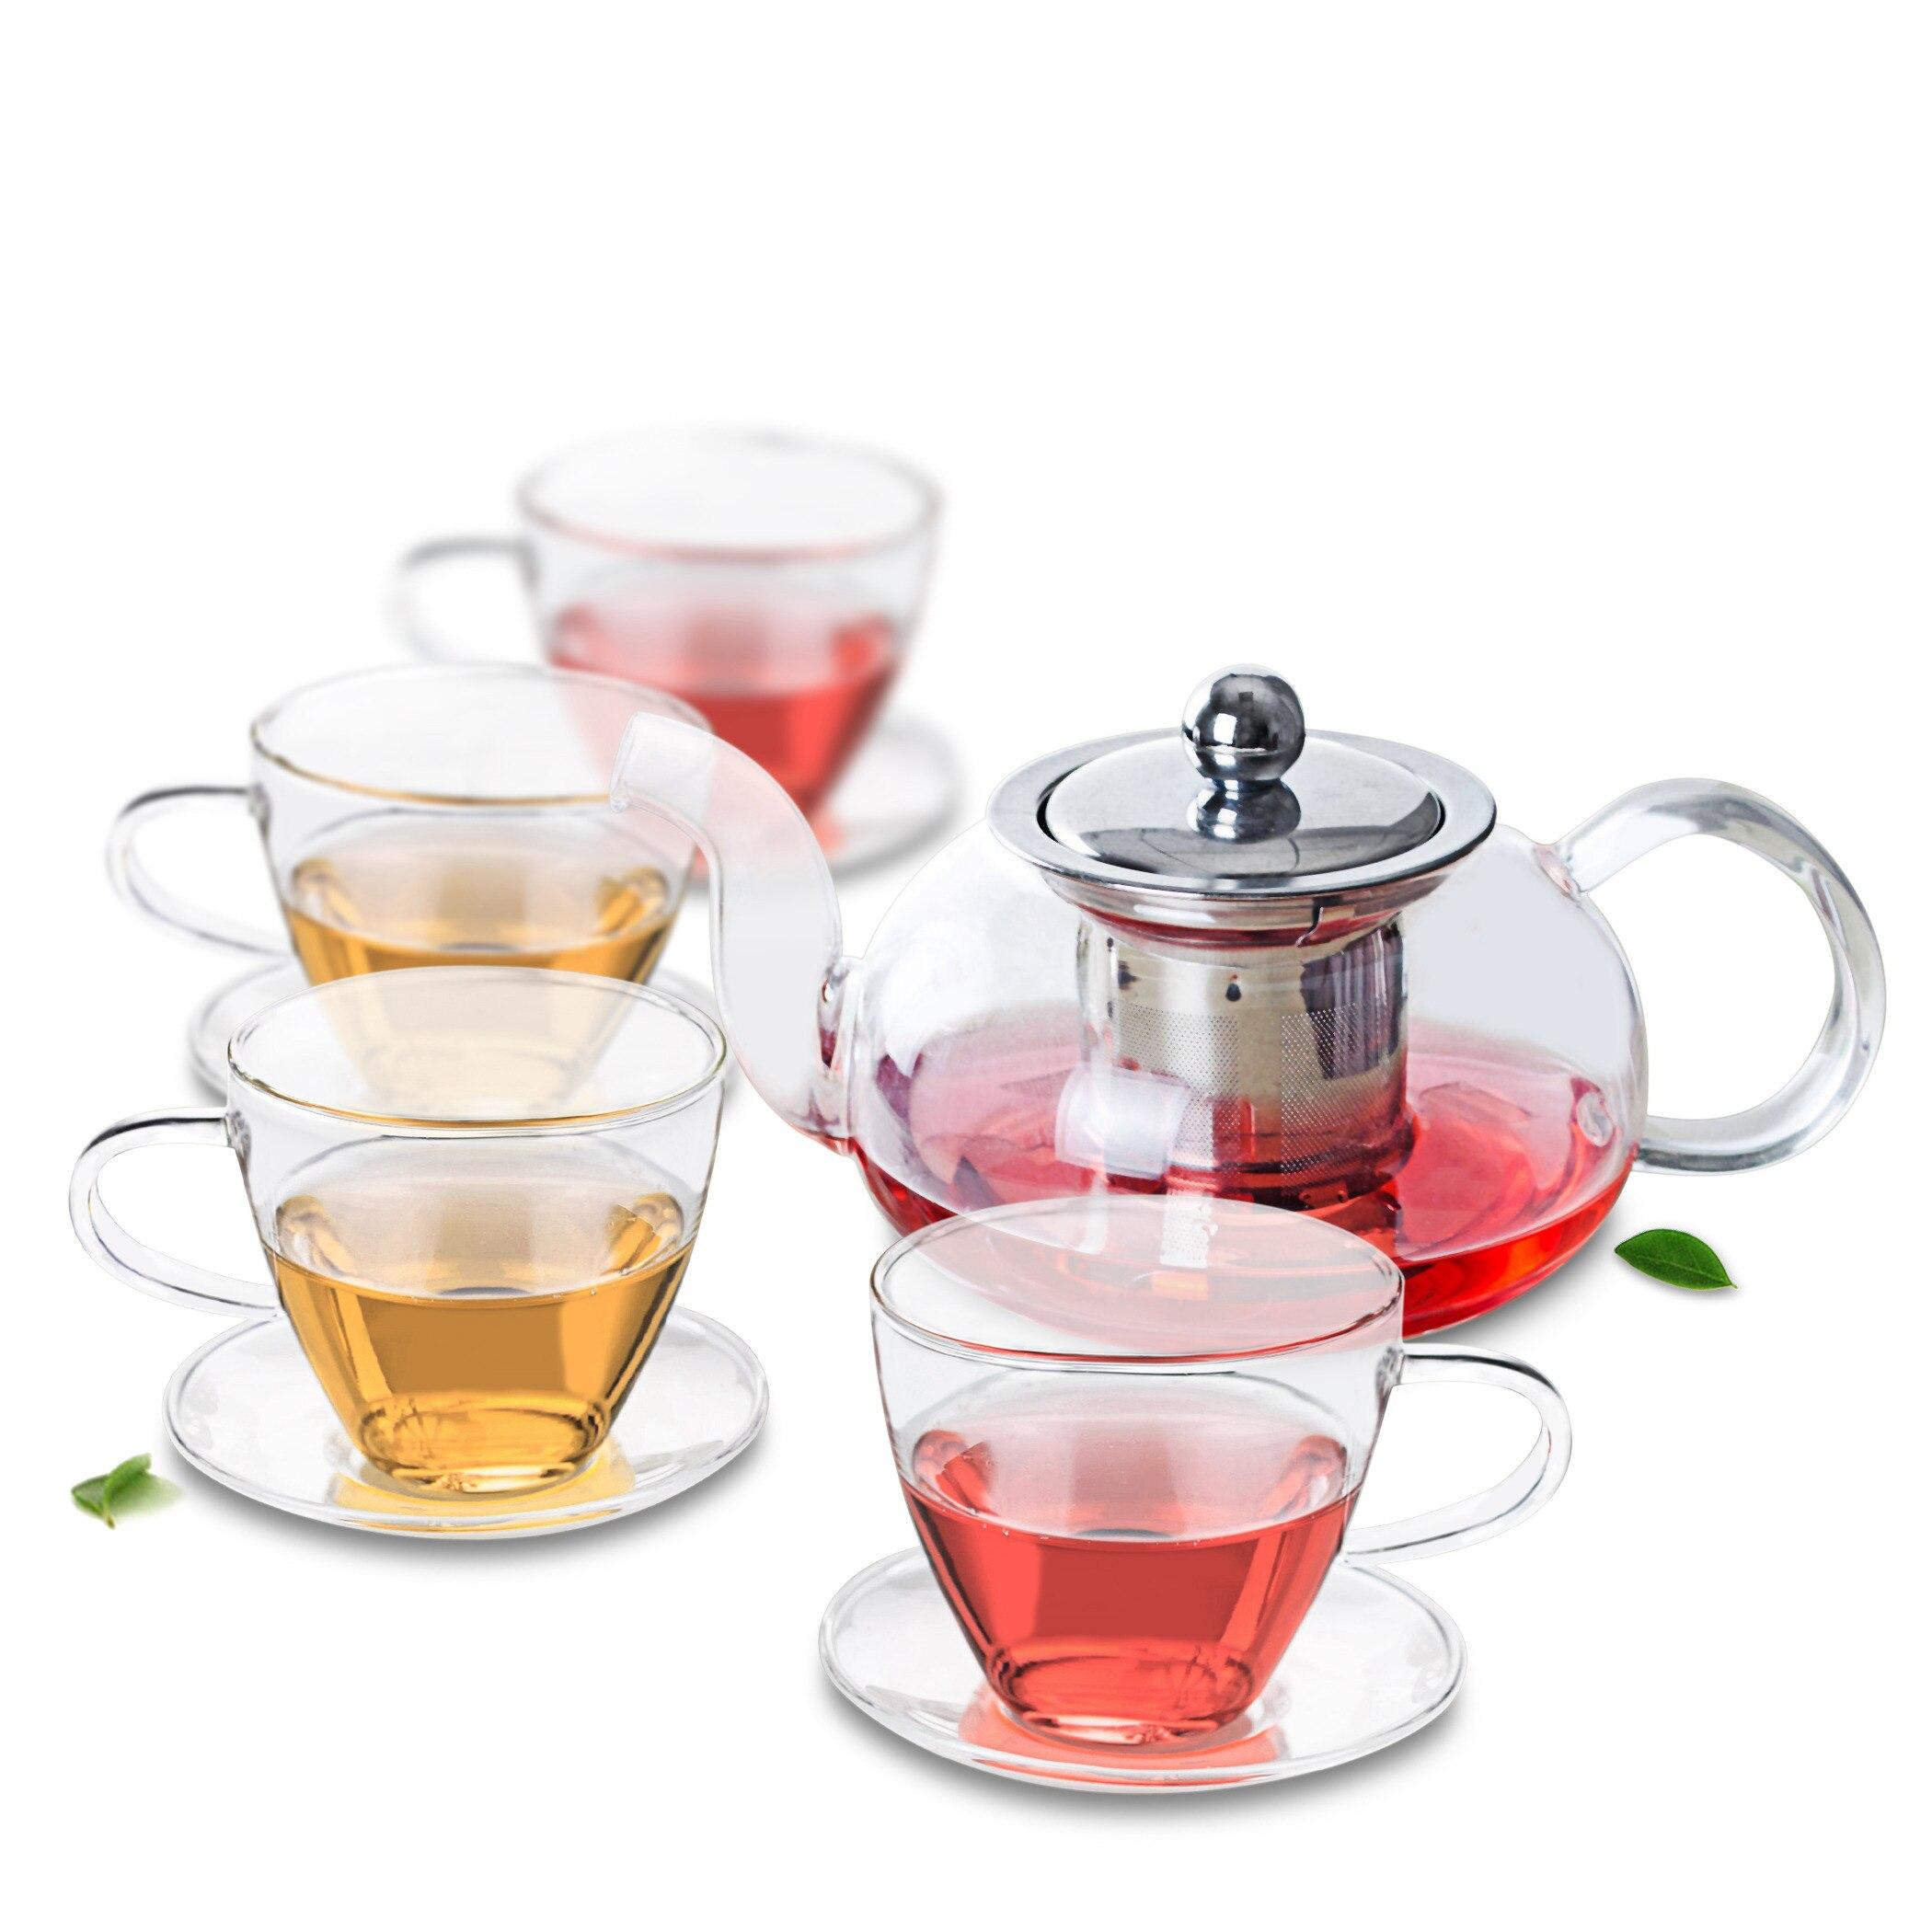 1x طقم شاي زجاجي مقاوم للحرارة-إبريق شاي 625 مللي ث/مصفاة وغطاء ستانلس ستيل + 4x طقم من 160 مللي أكواب الشاي والصحون